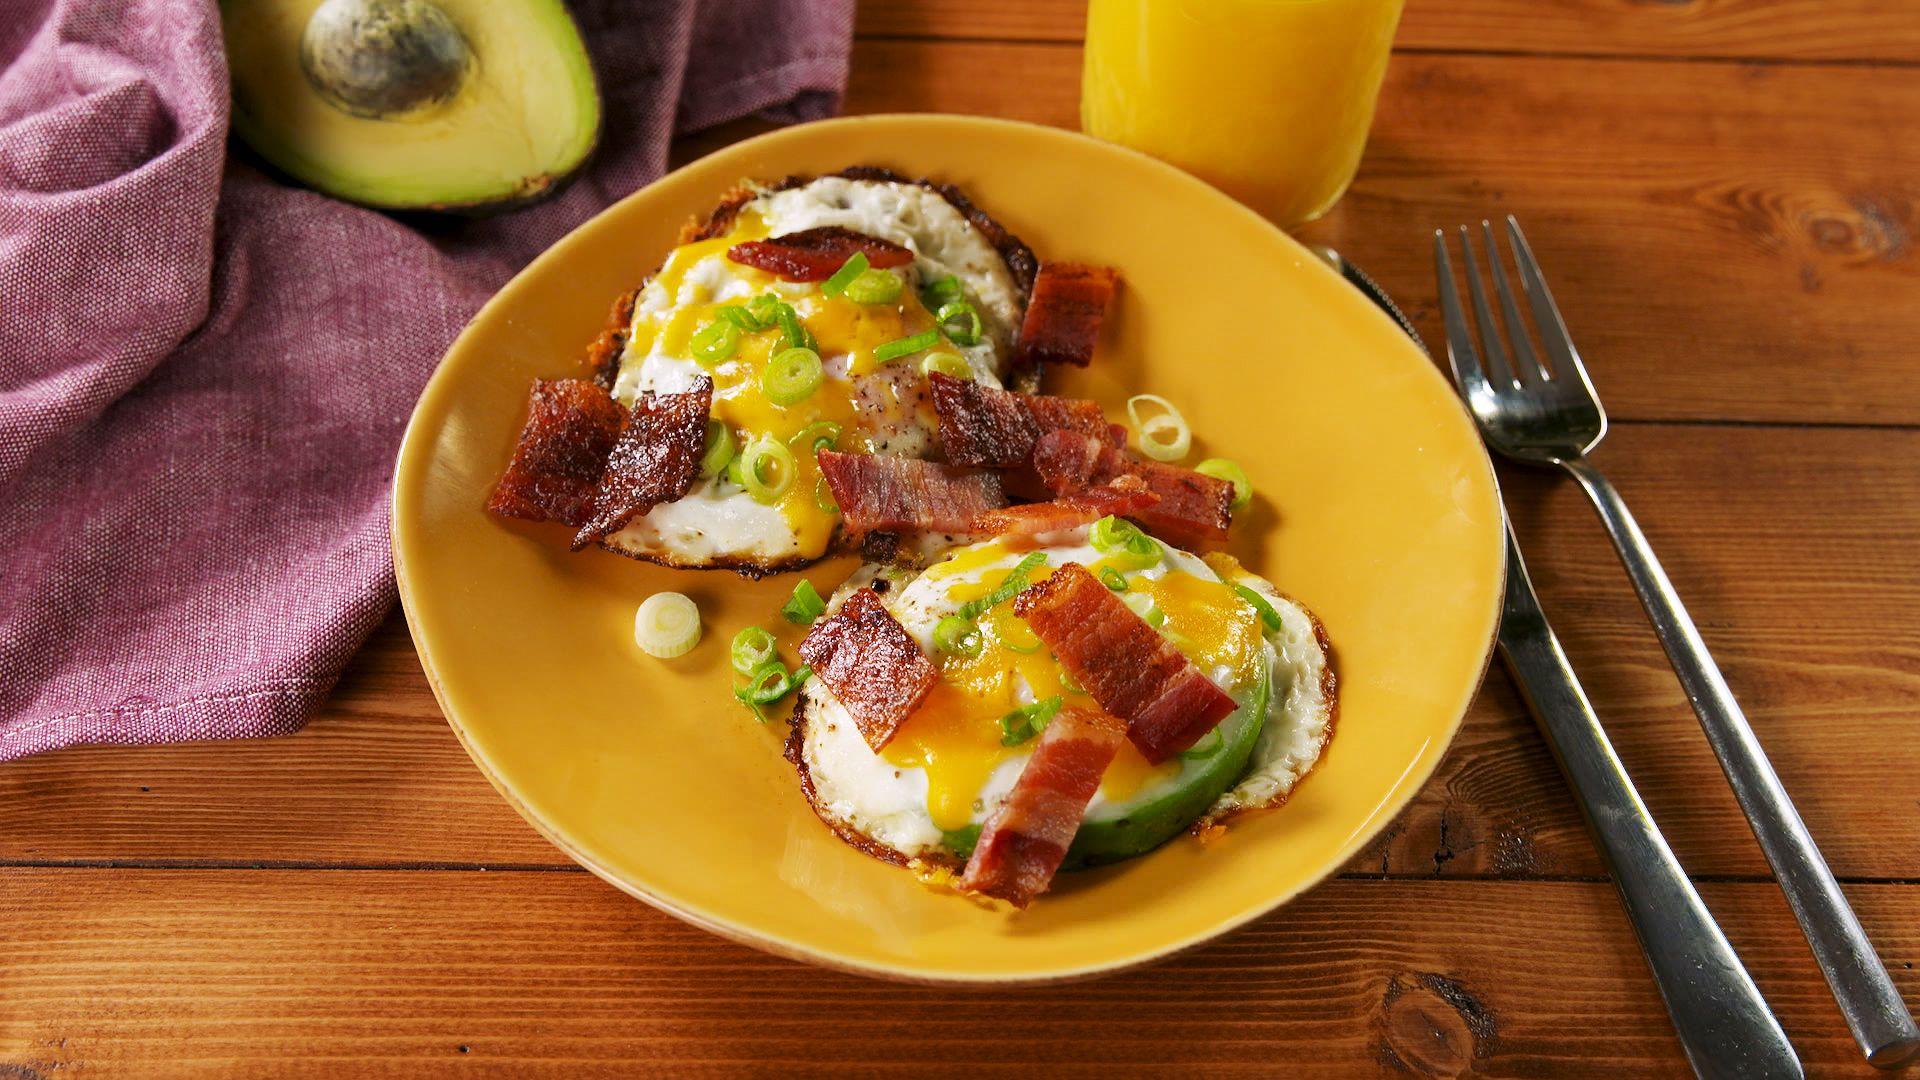 Avocado Egg-In-A-Hole